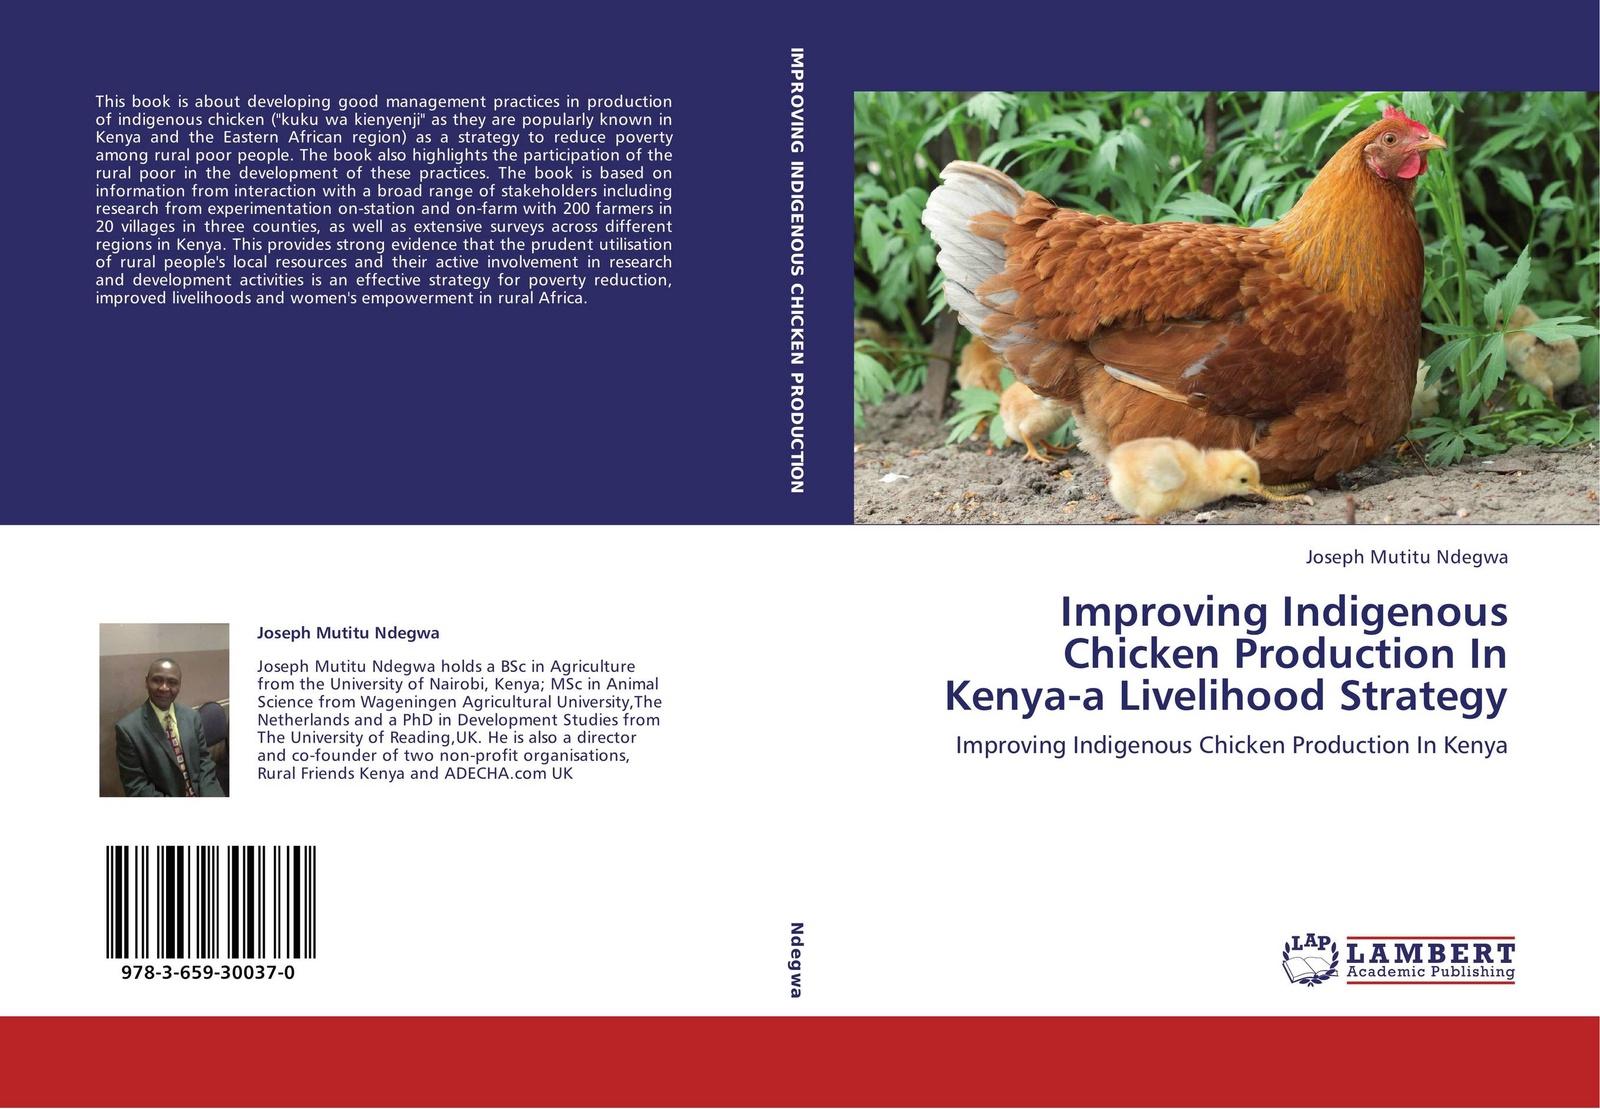 Joseph Mutitu Ndegwa Improving Indigenous Chicken Production In Kenya-a Livelihood Strategy persistence of poverty in rural ghana